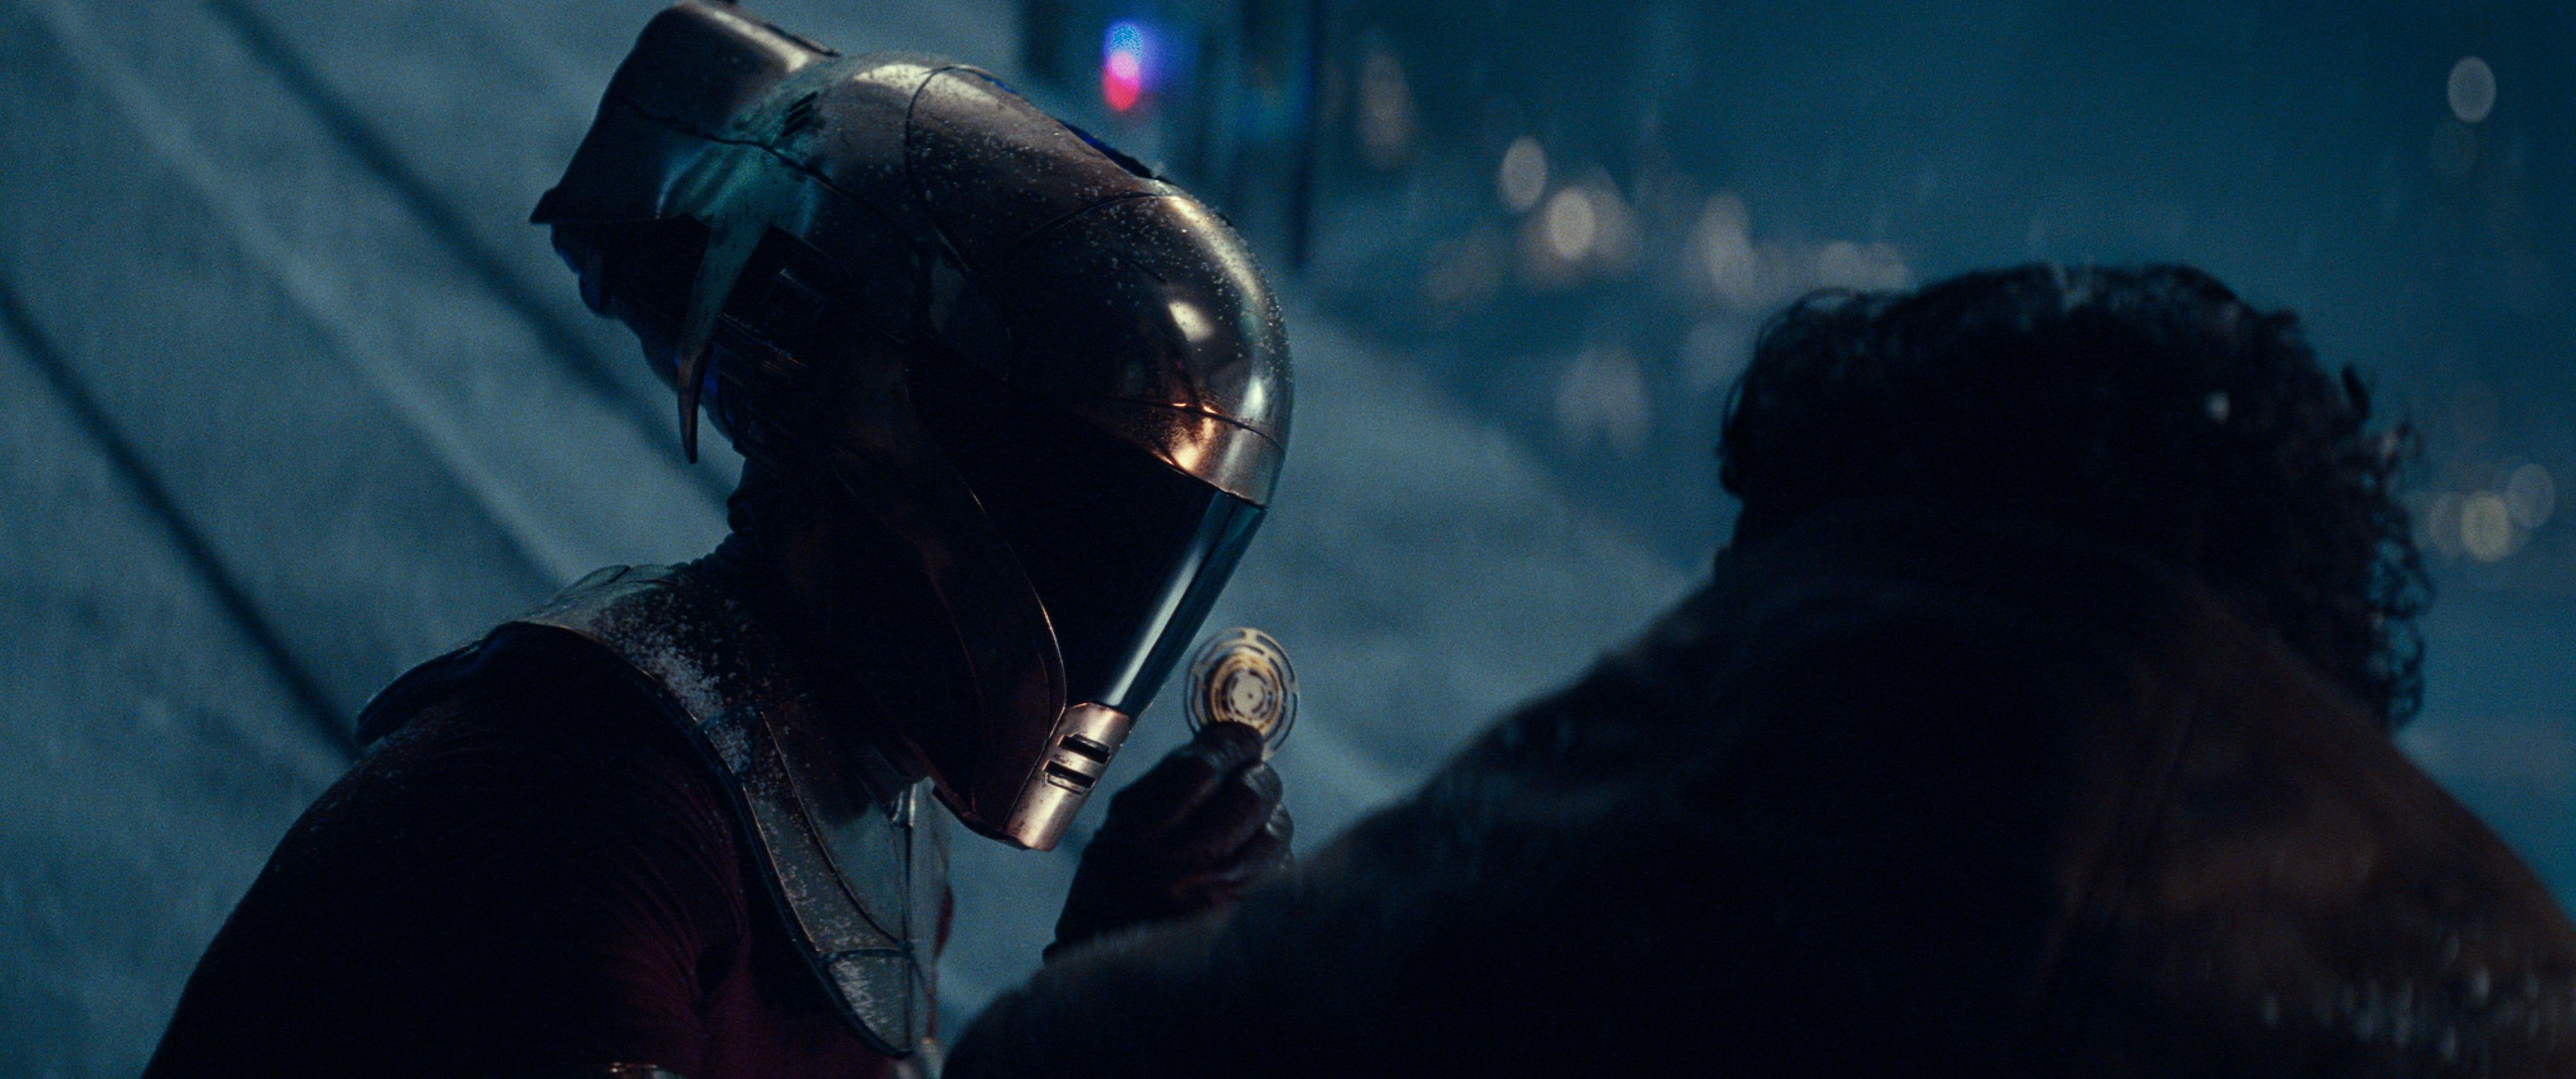 Star Wars Keri Russell Rocks Amazing Helmet In Rise Of Skywalker